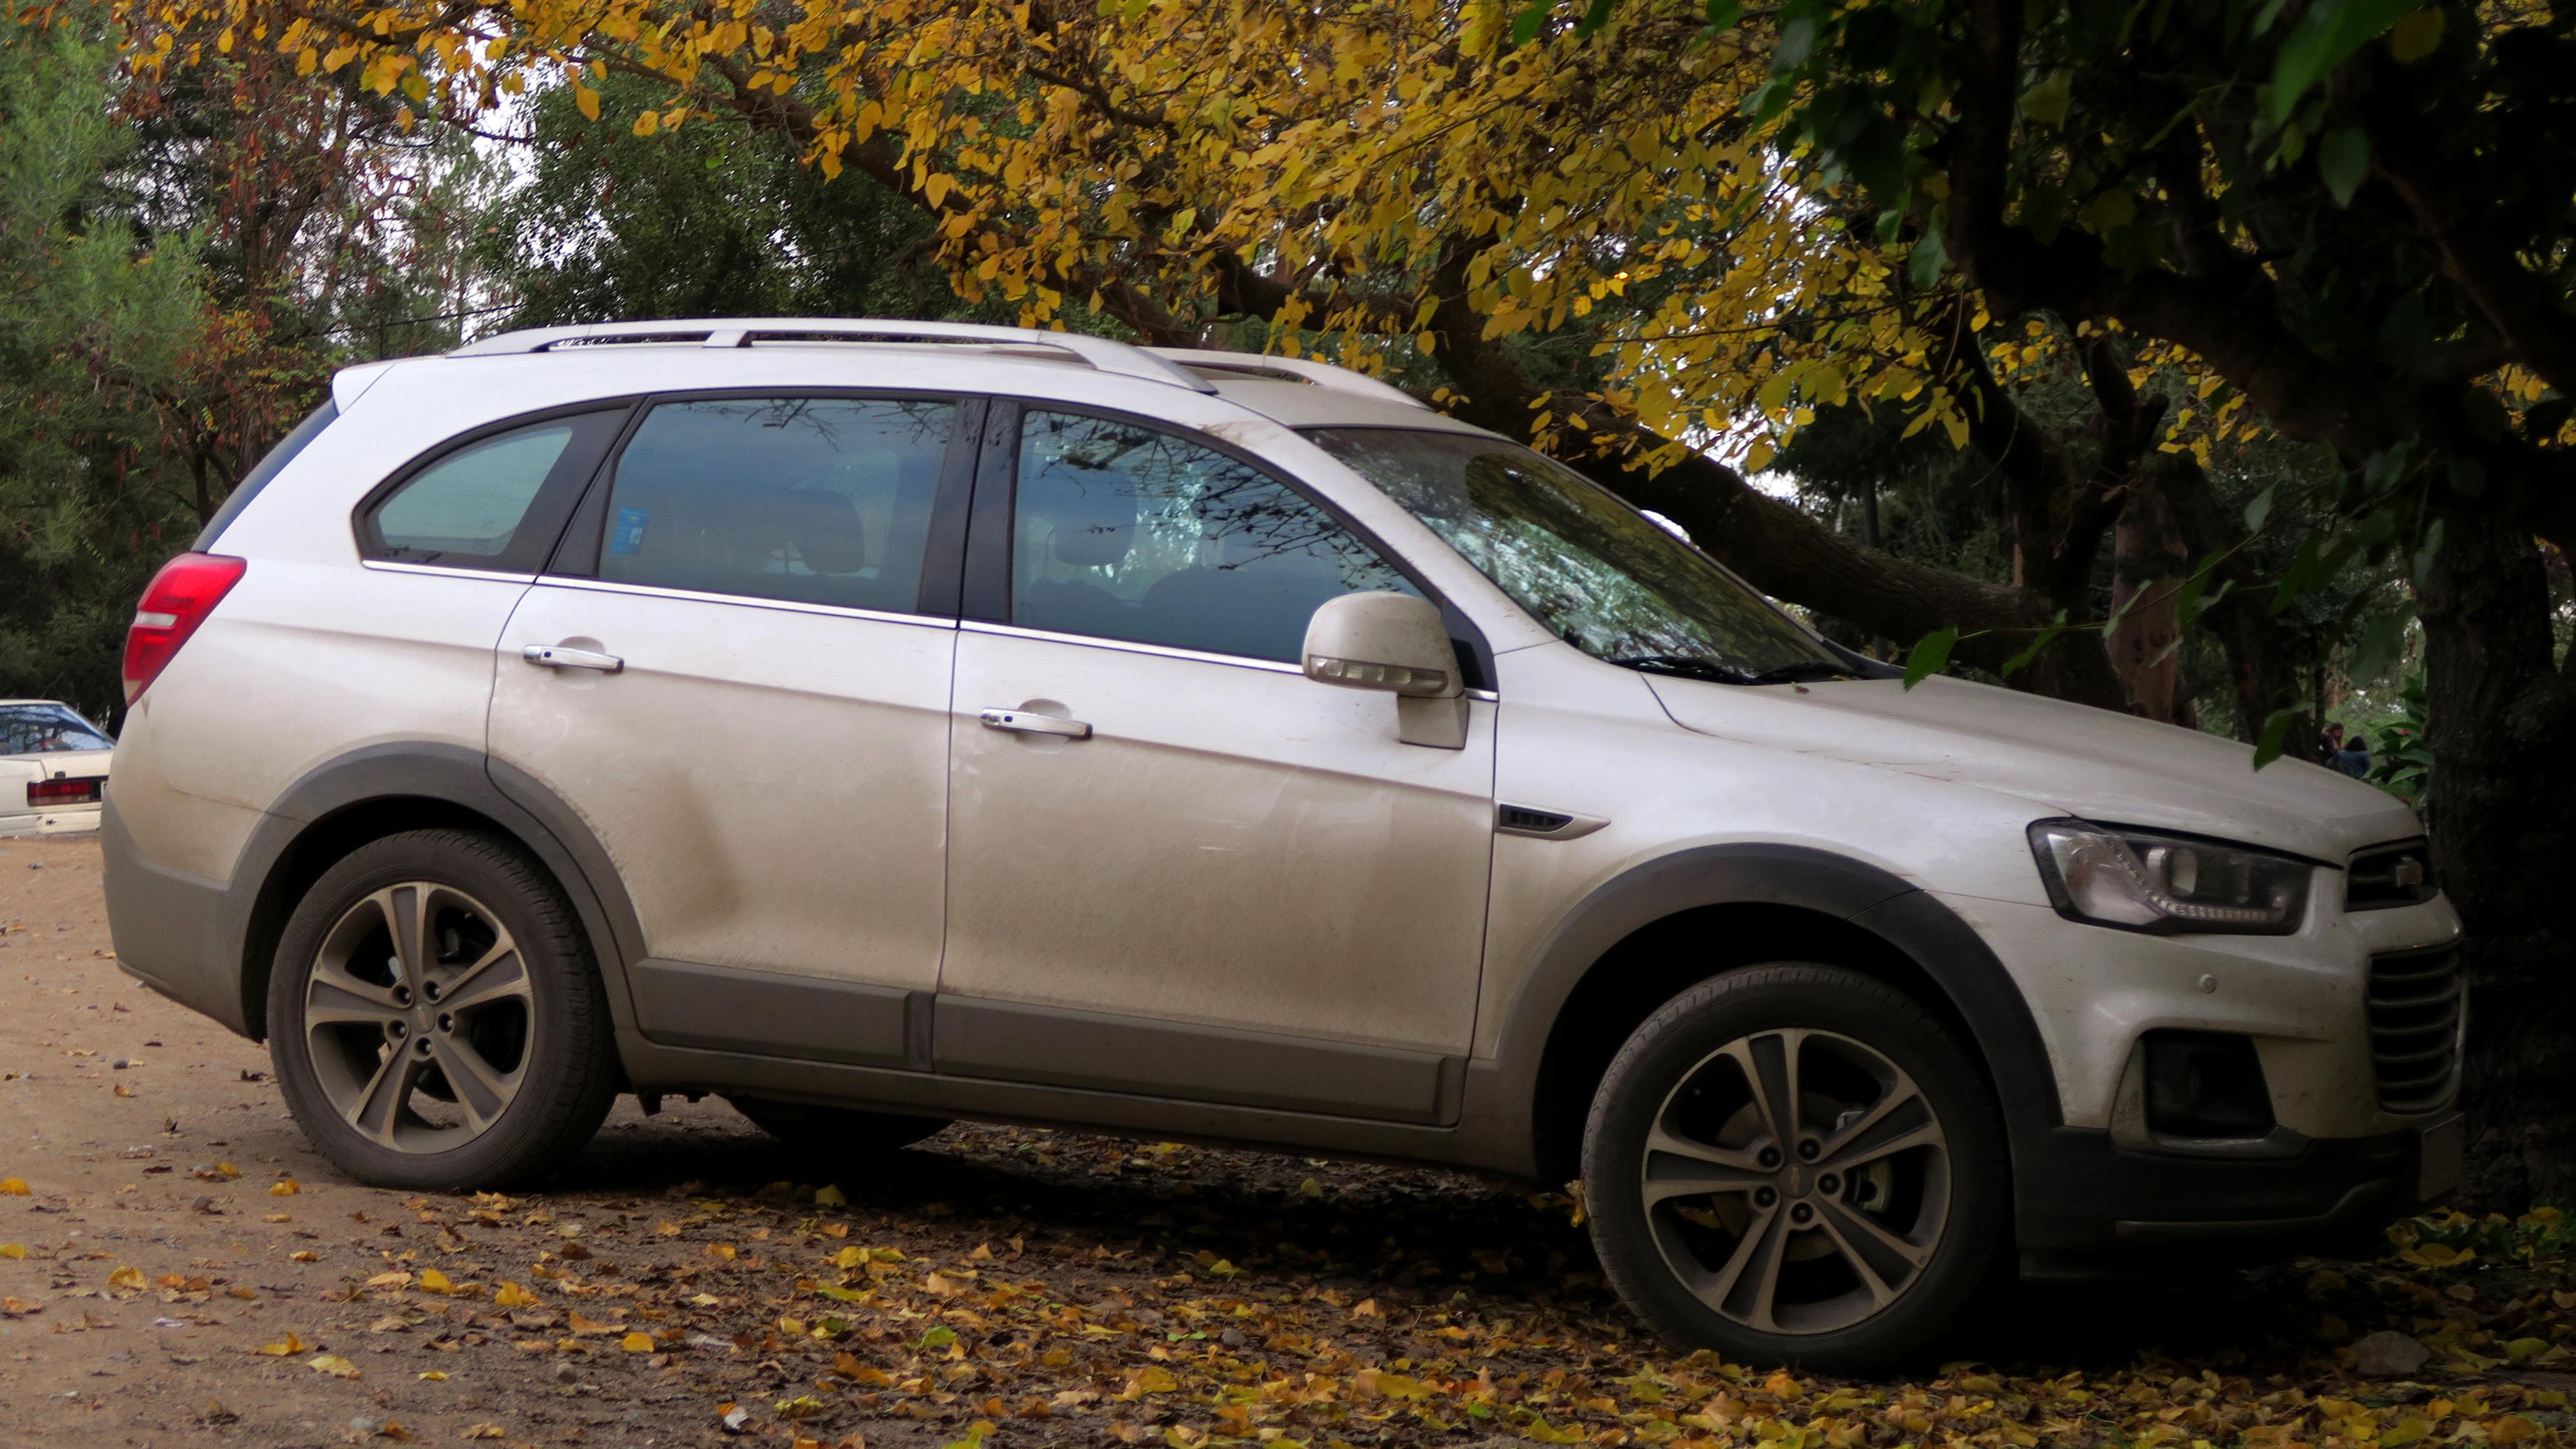 Kekurangan Chevrolet Captiva 2018 Tangguh